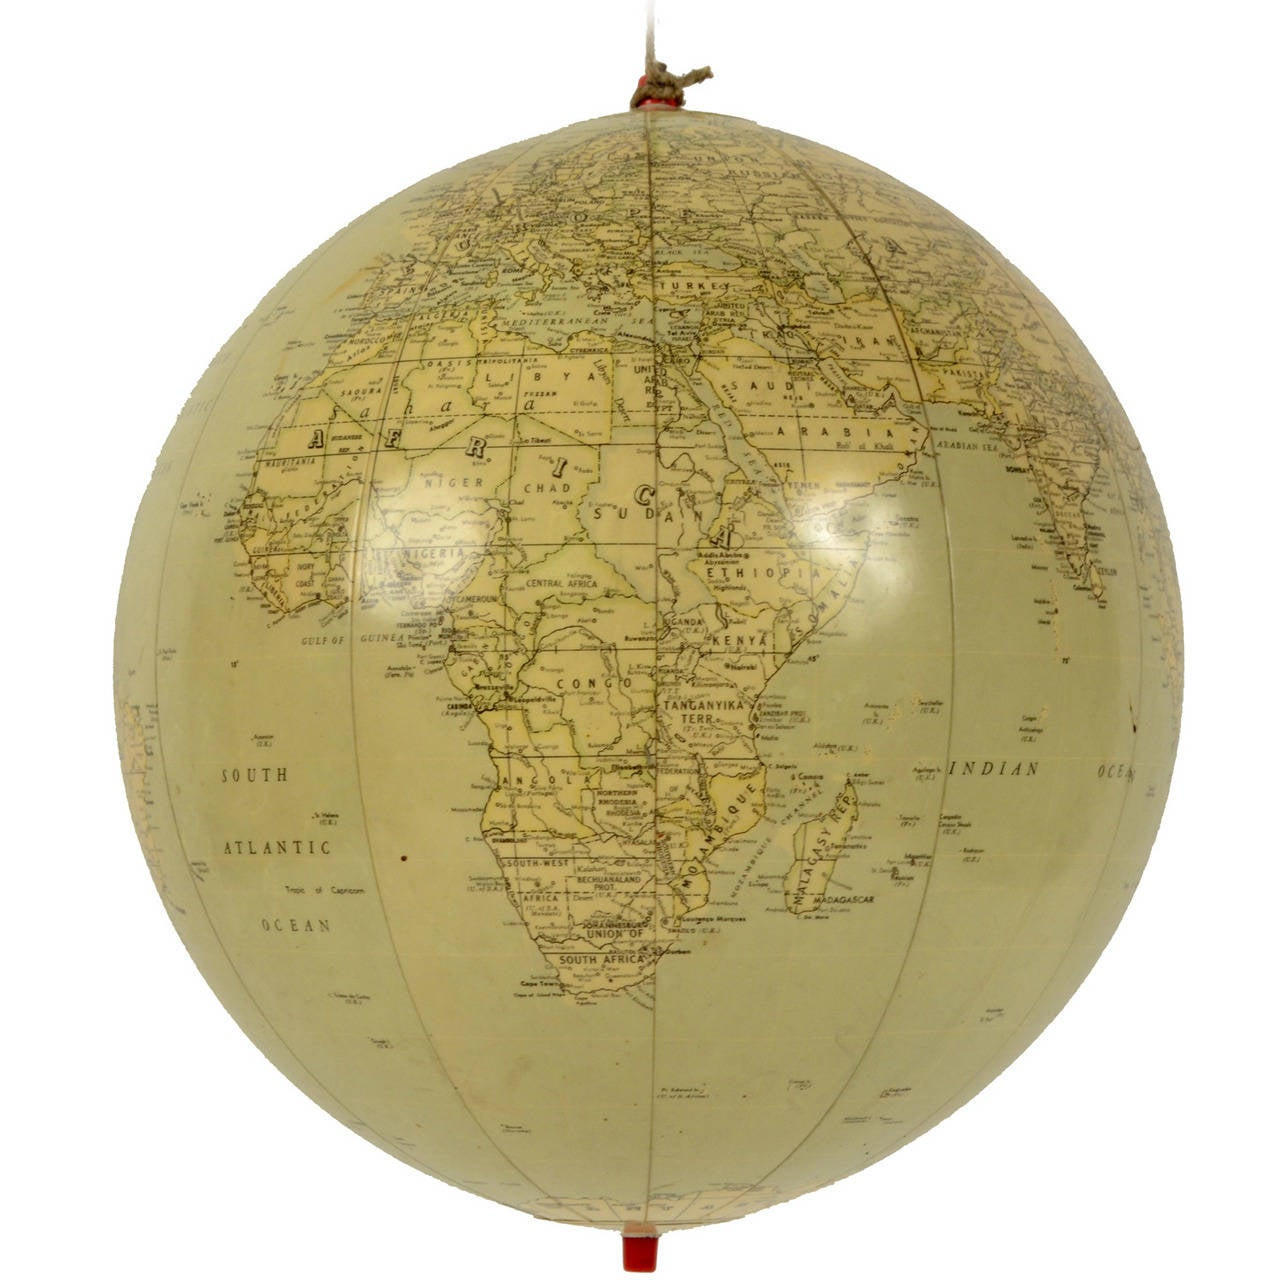 Balloon Terrestrial Globe Shaped, 1950s